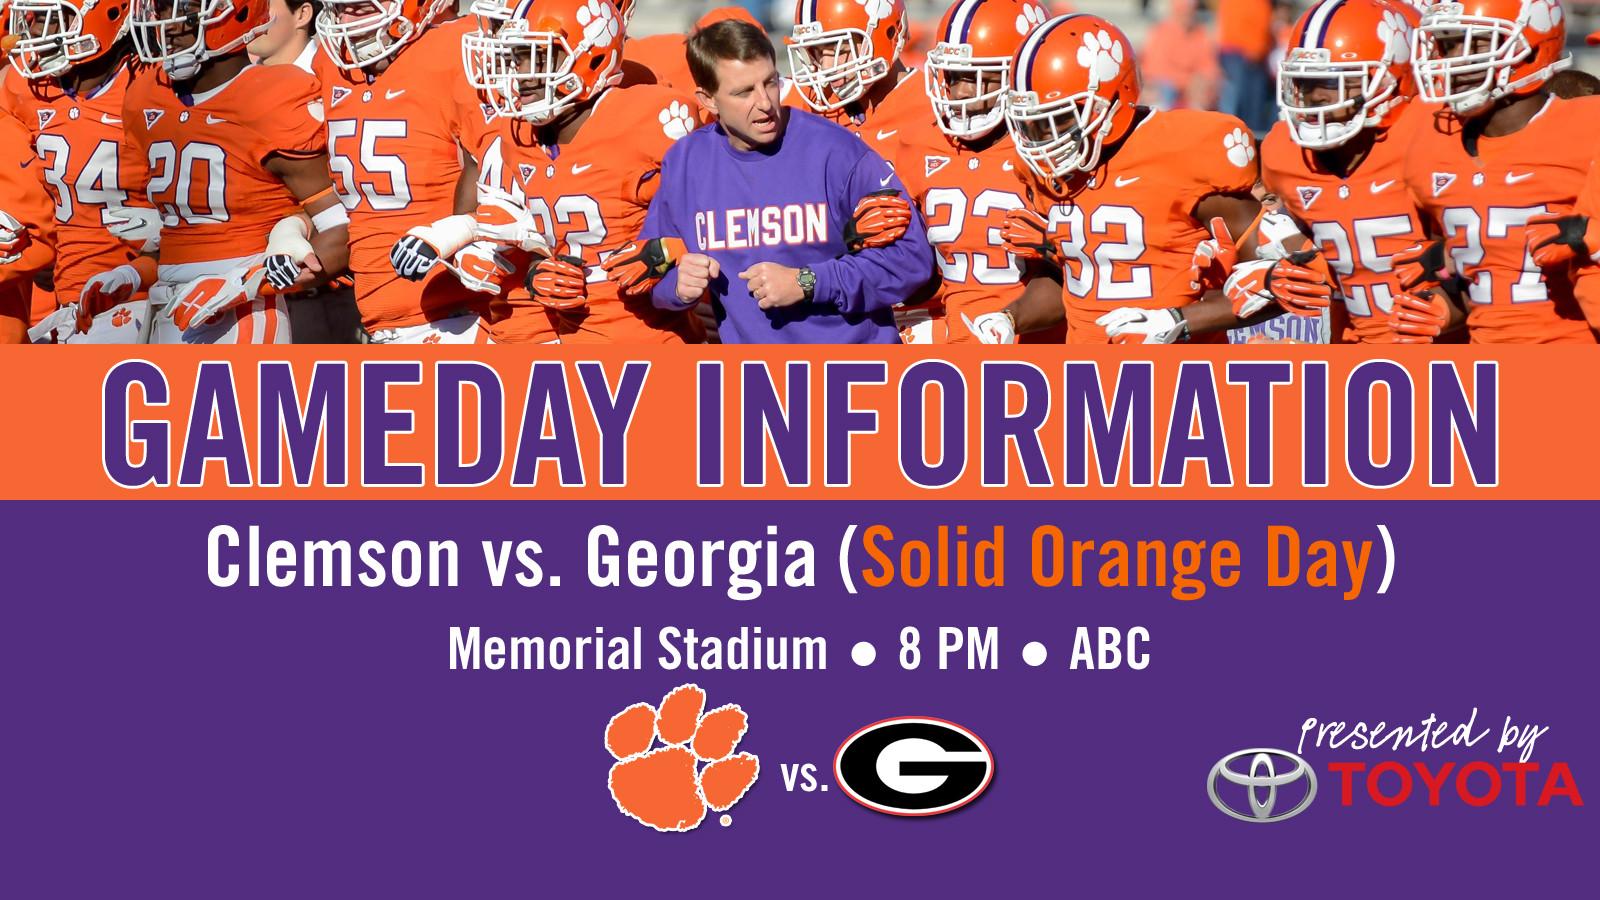 Clemson vs. Georgia Football Gameday Information Guide